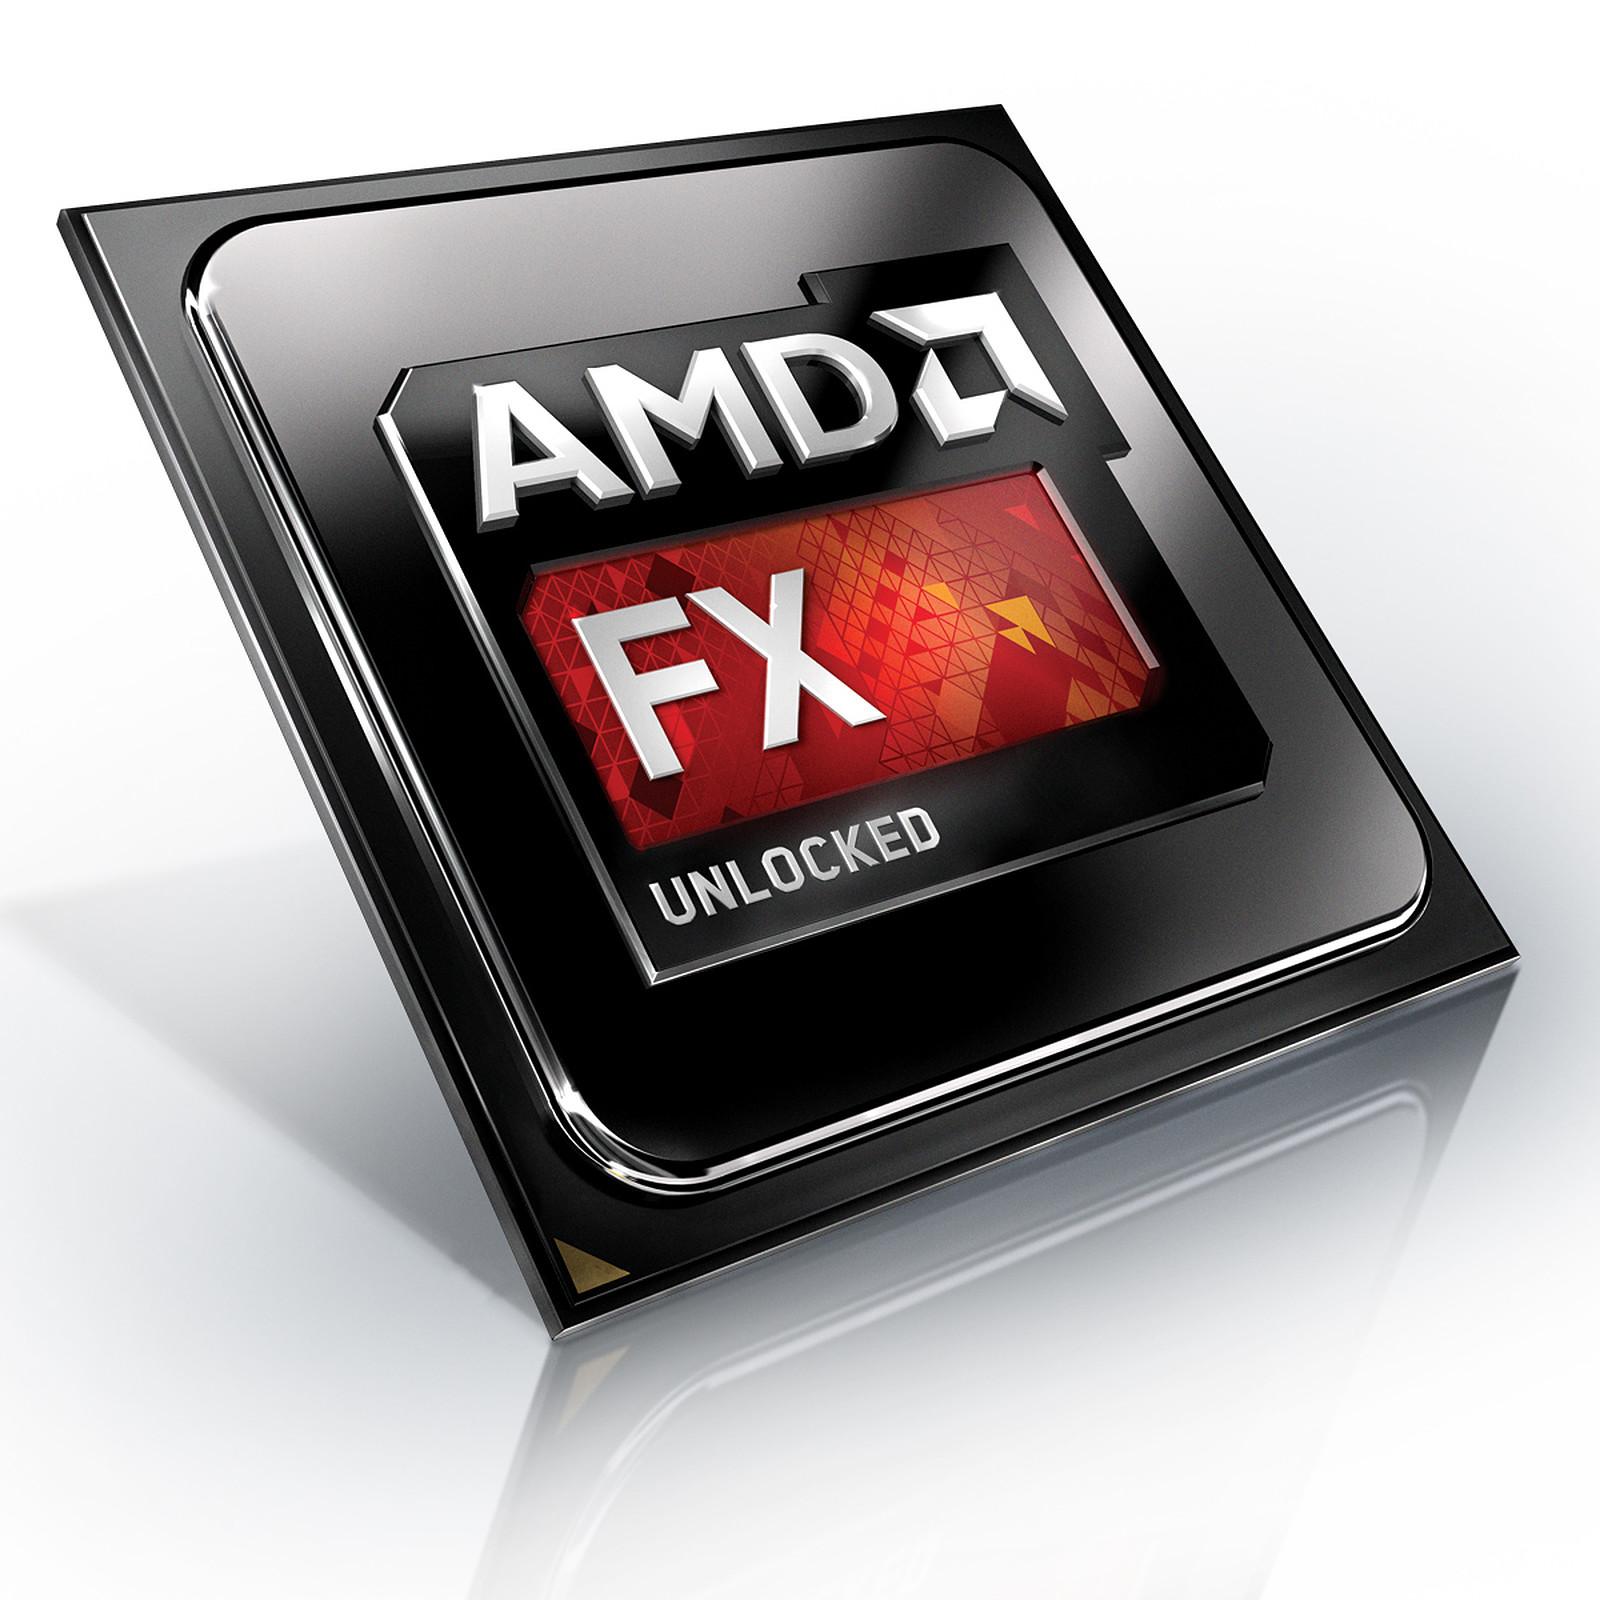 AMD FX 9590 Unlocked (5.0 GHz Max Turbo)